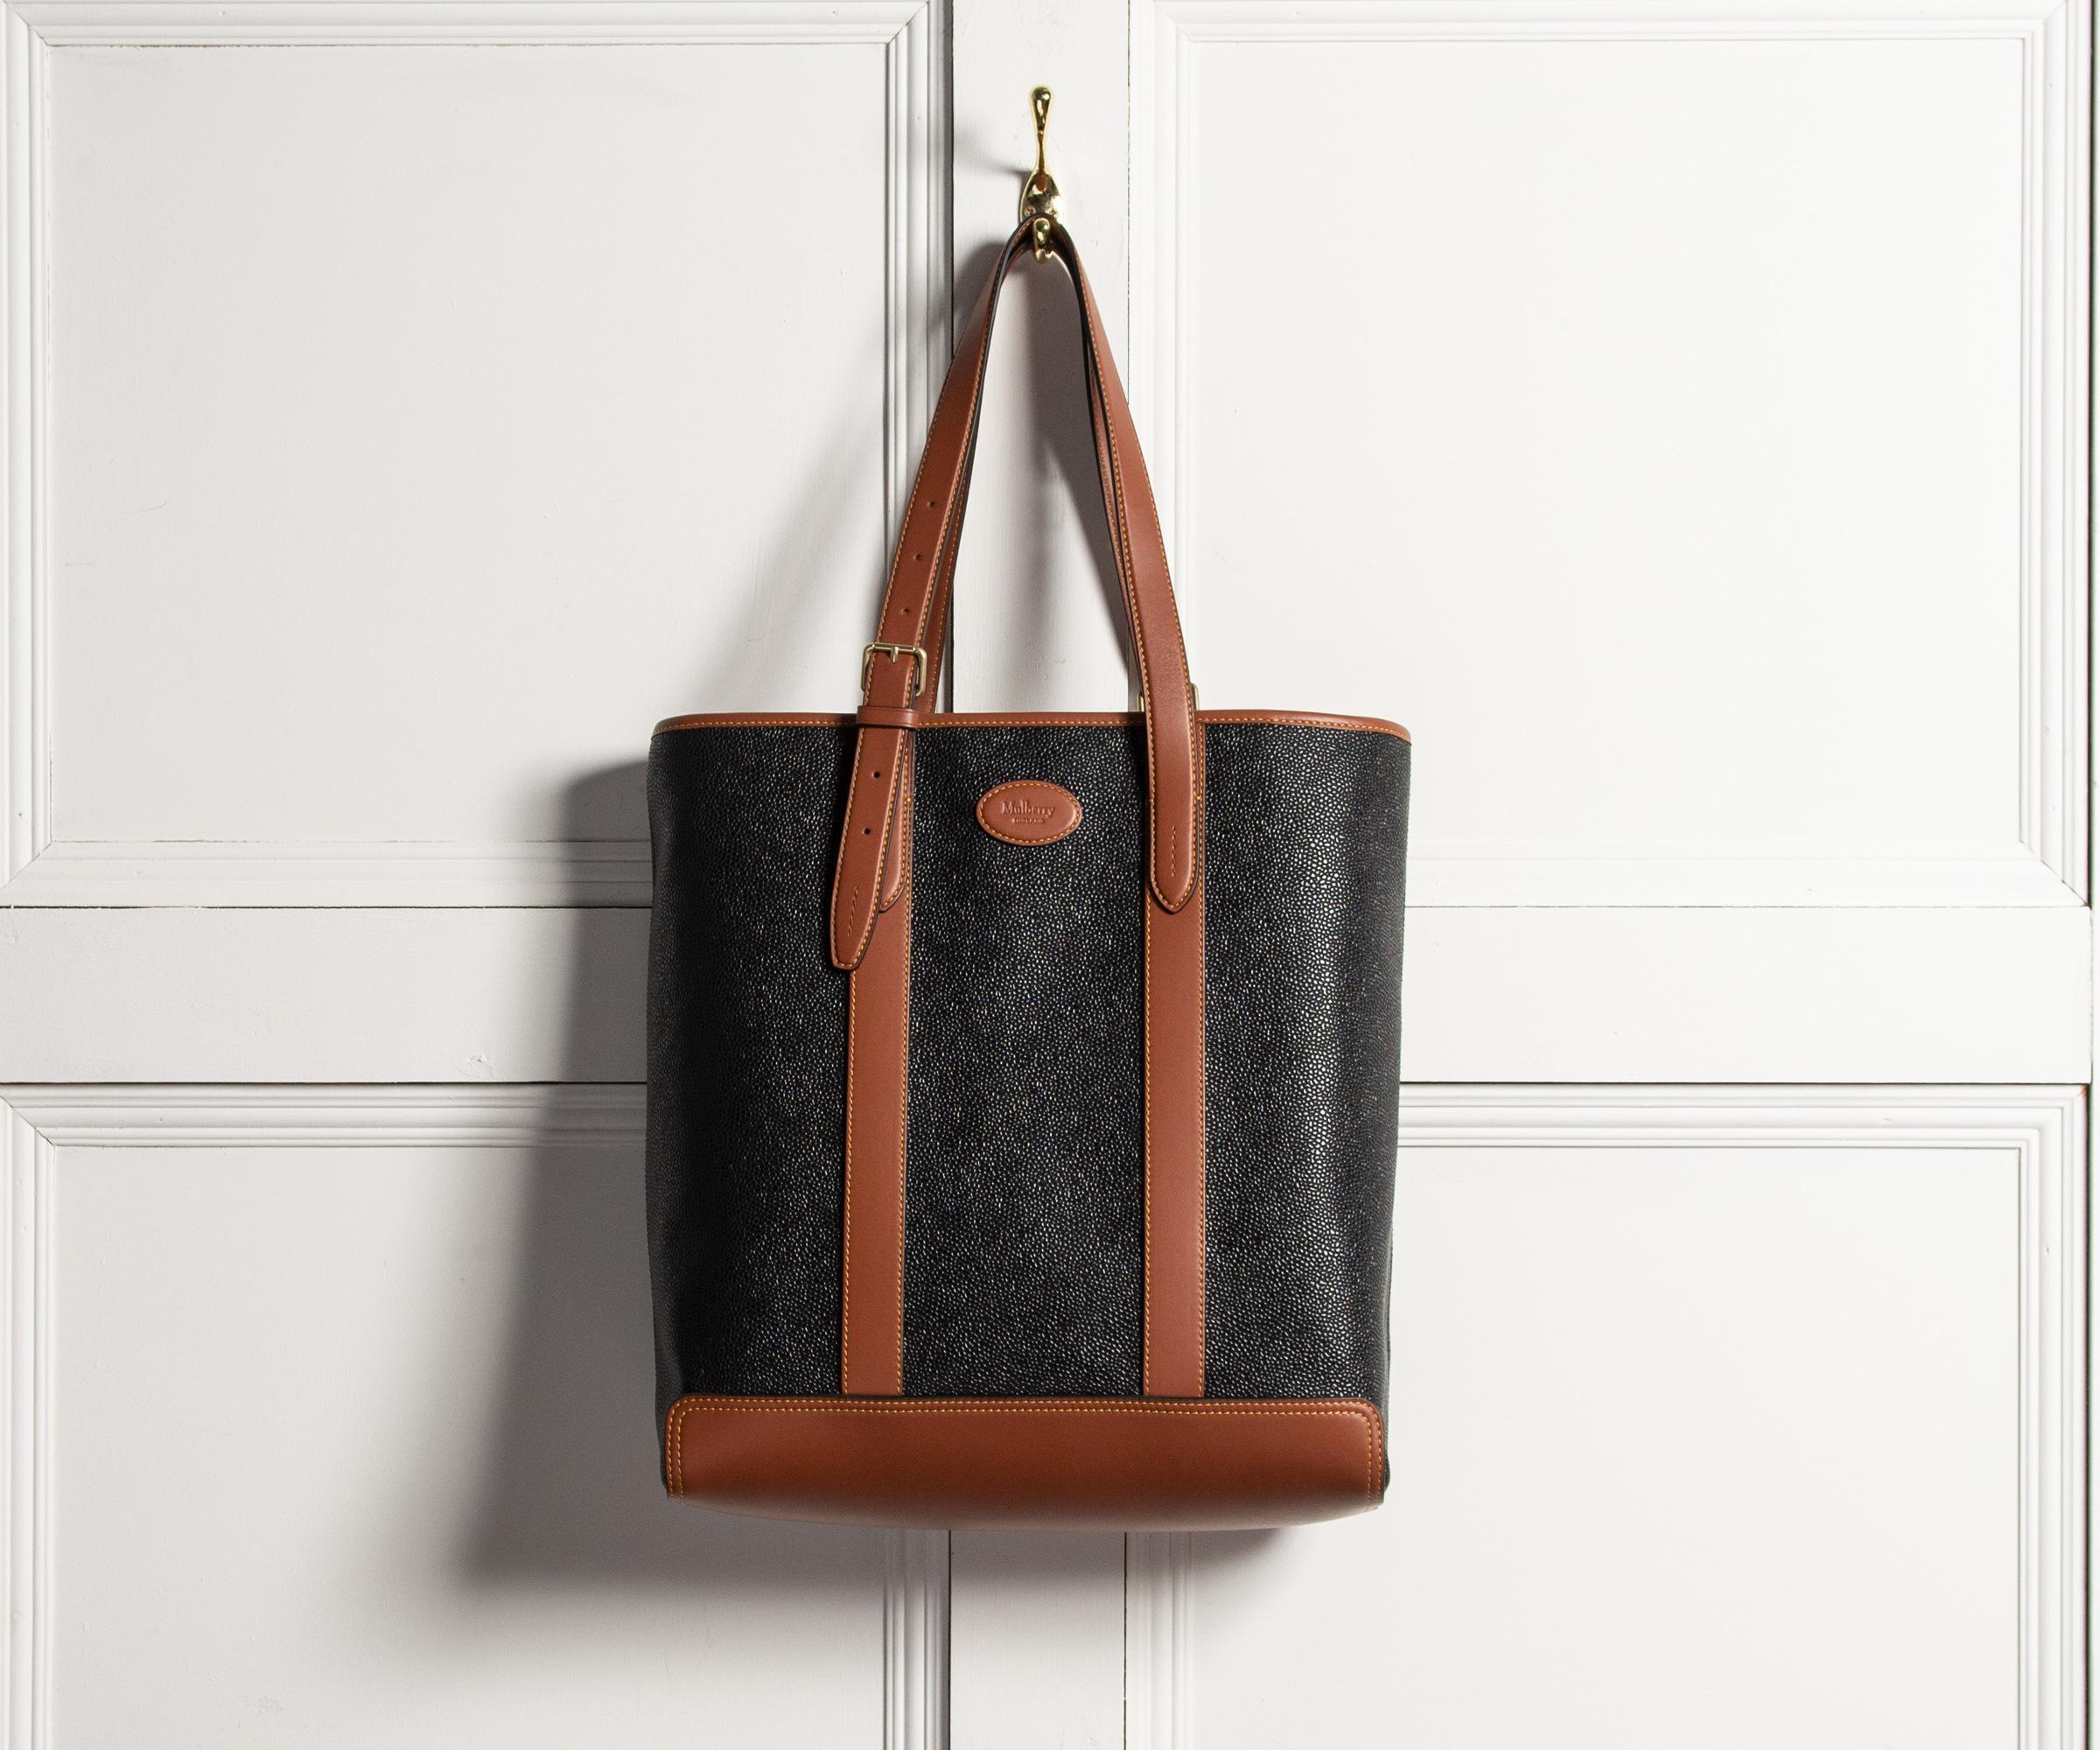 de2f8d375a Lyst - Mulberry Heritage Tote Cognac   Black in Black for Men